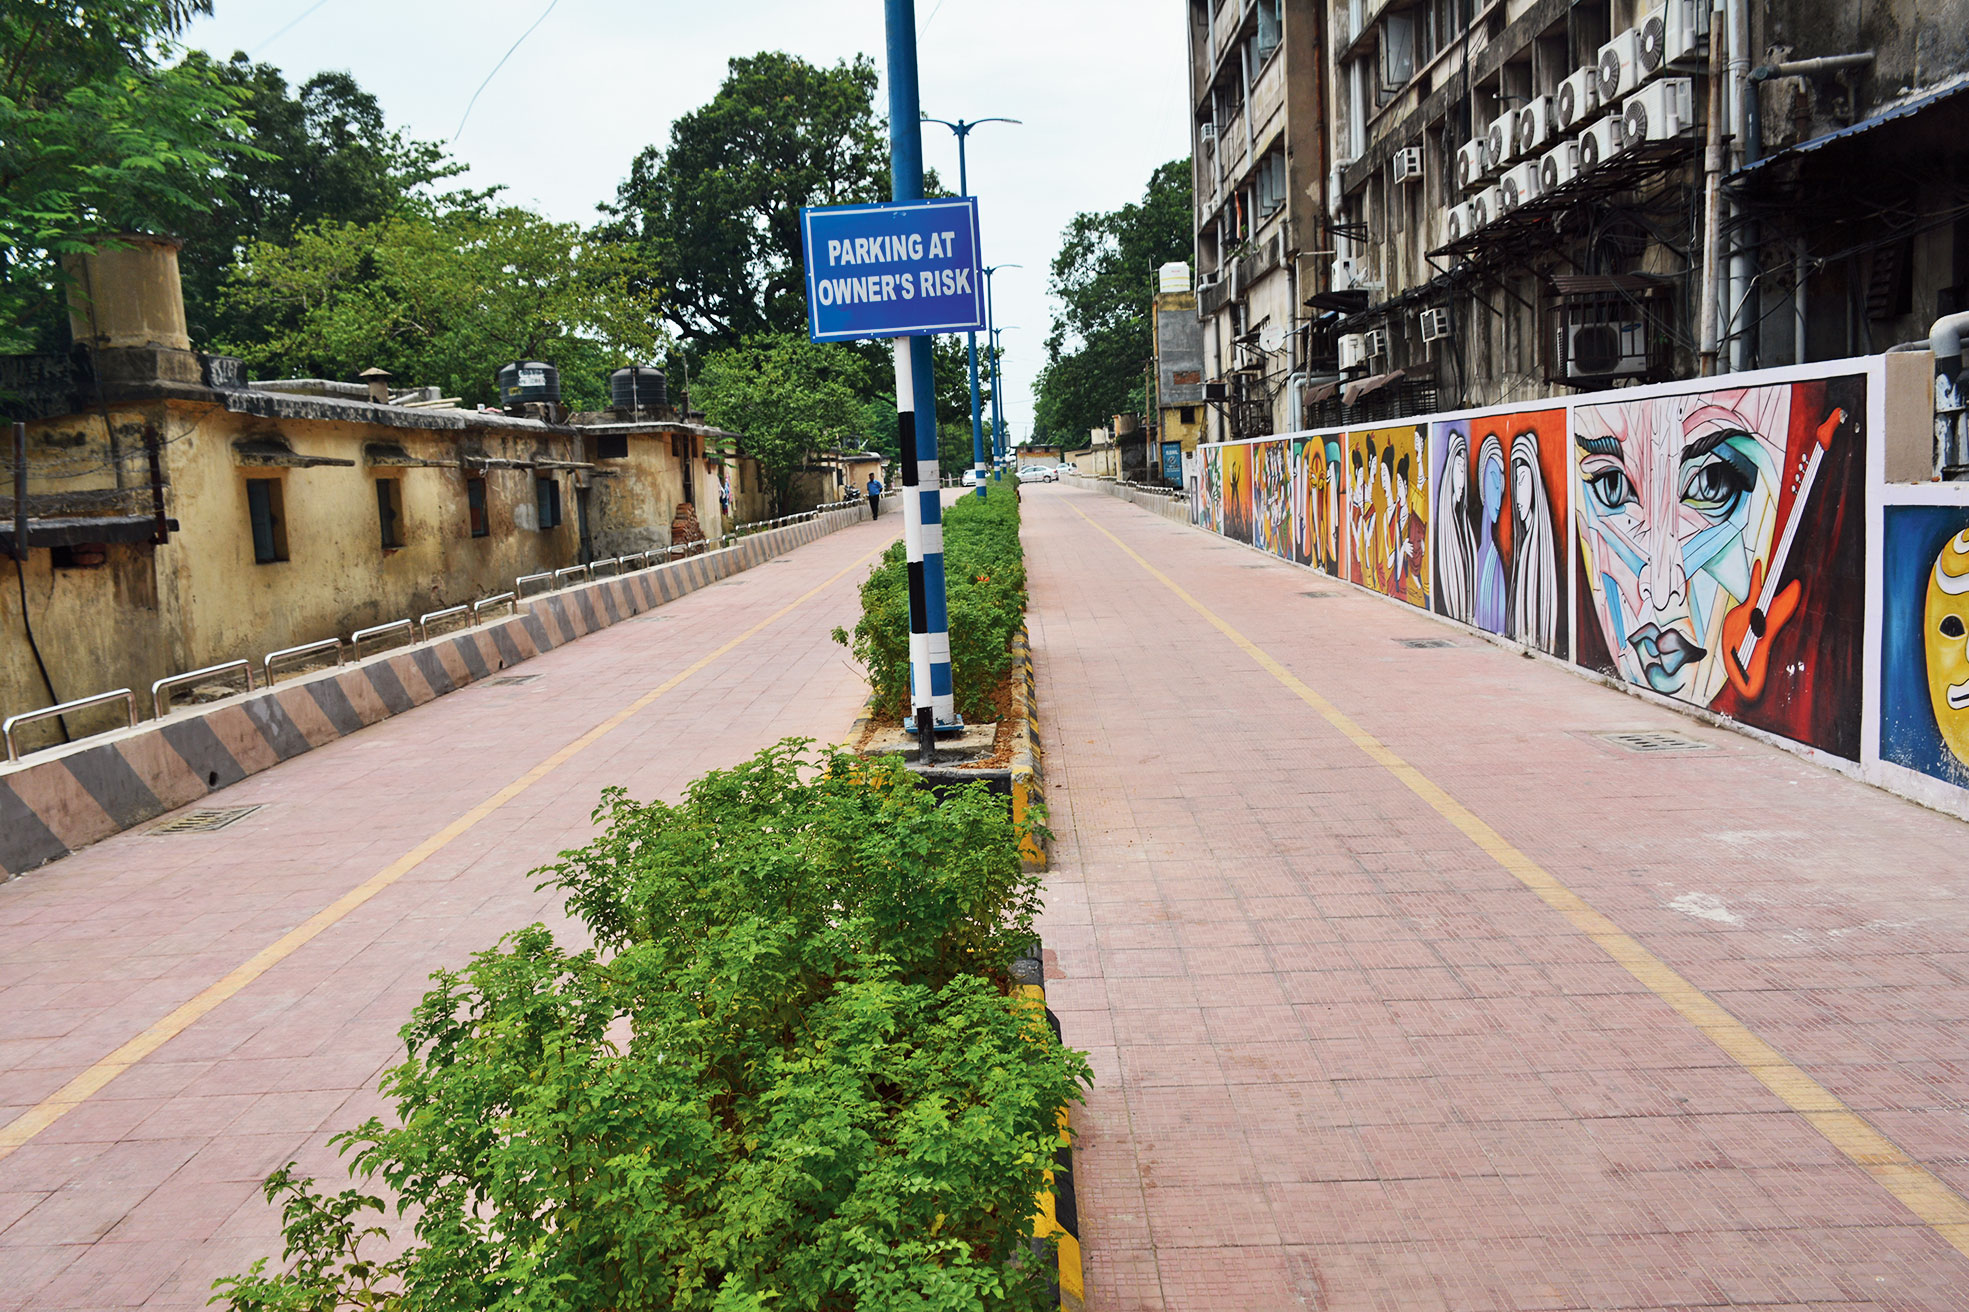 The parking lot in Bistupur, Jamshedpur, on Saturday.